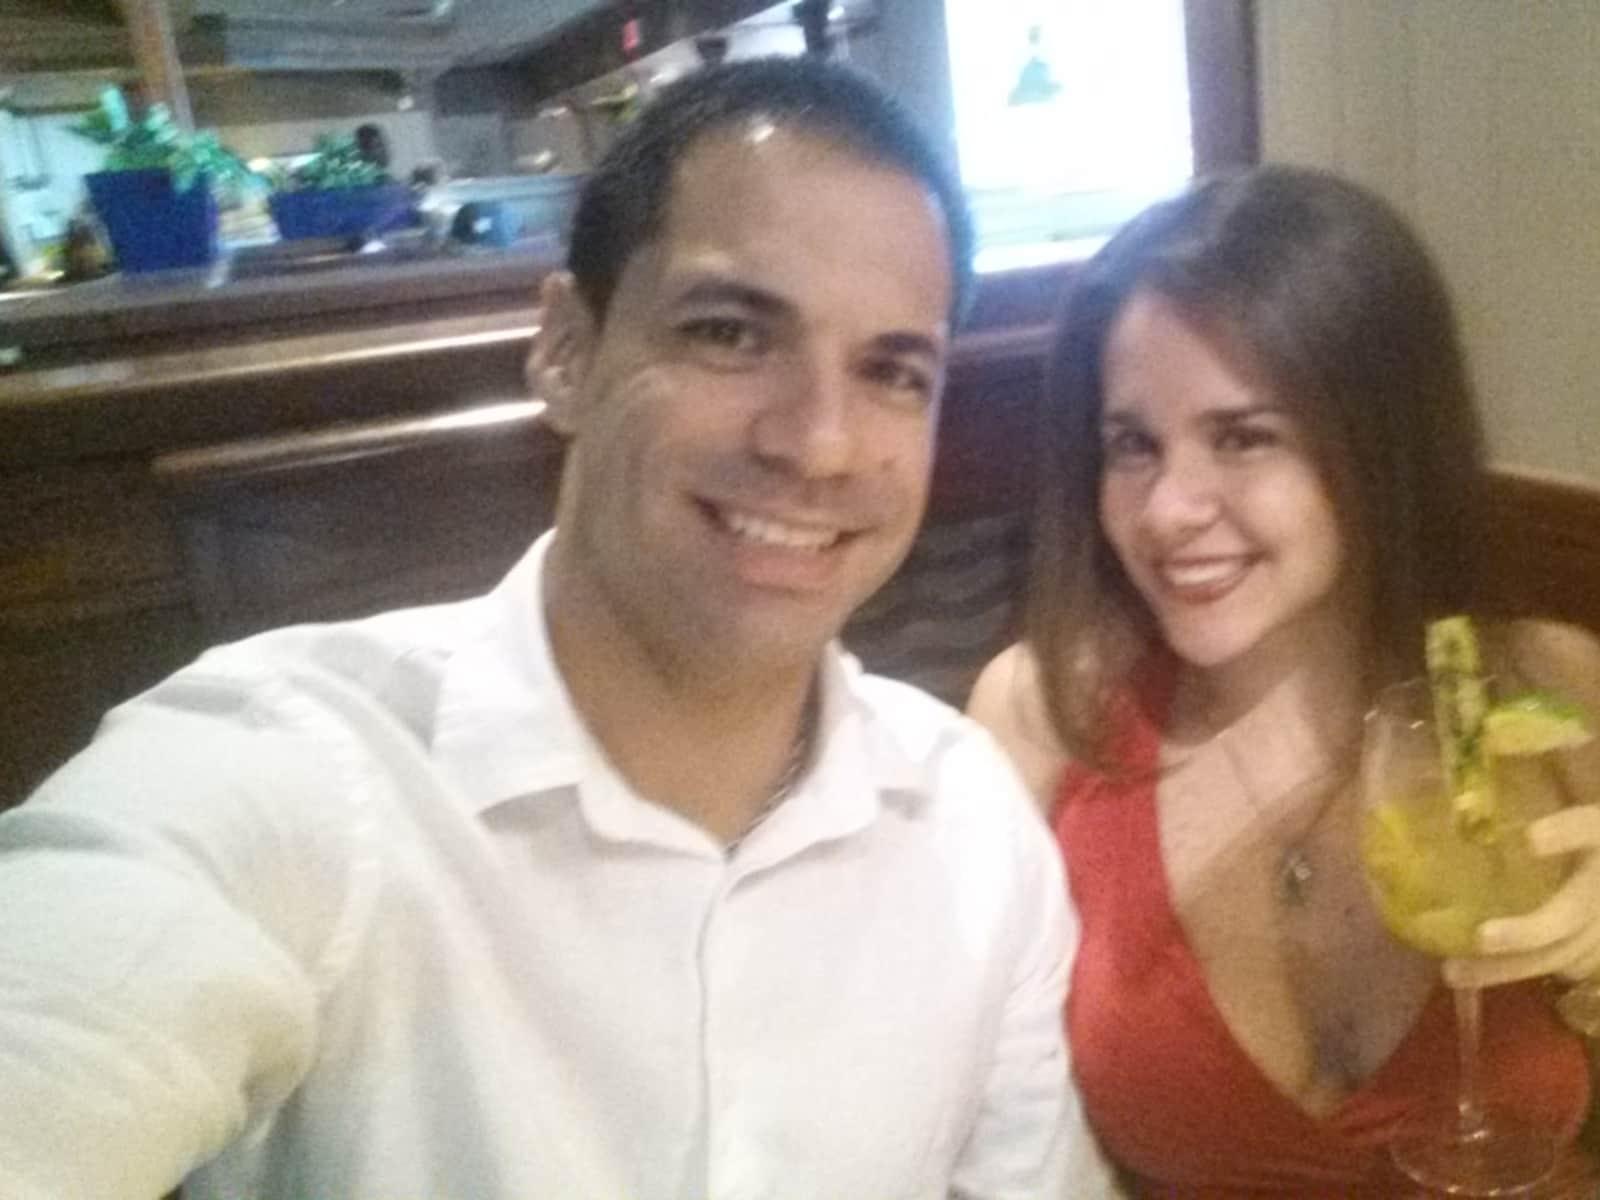 Edwin & Angela from Simpsonville, South Carolina, United States